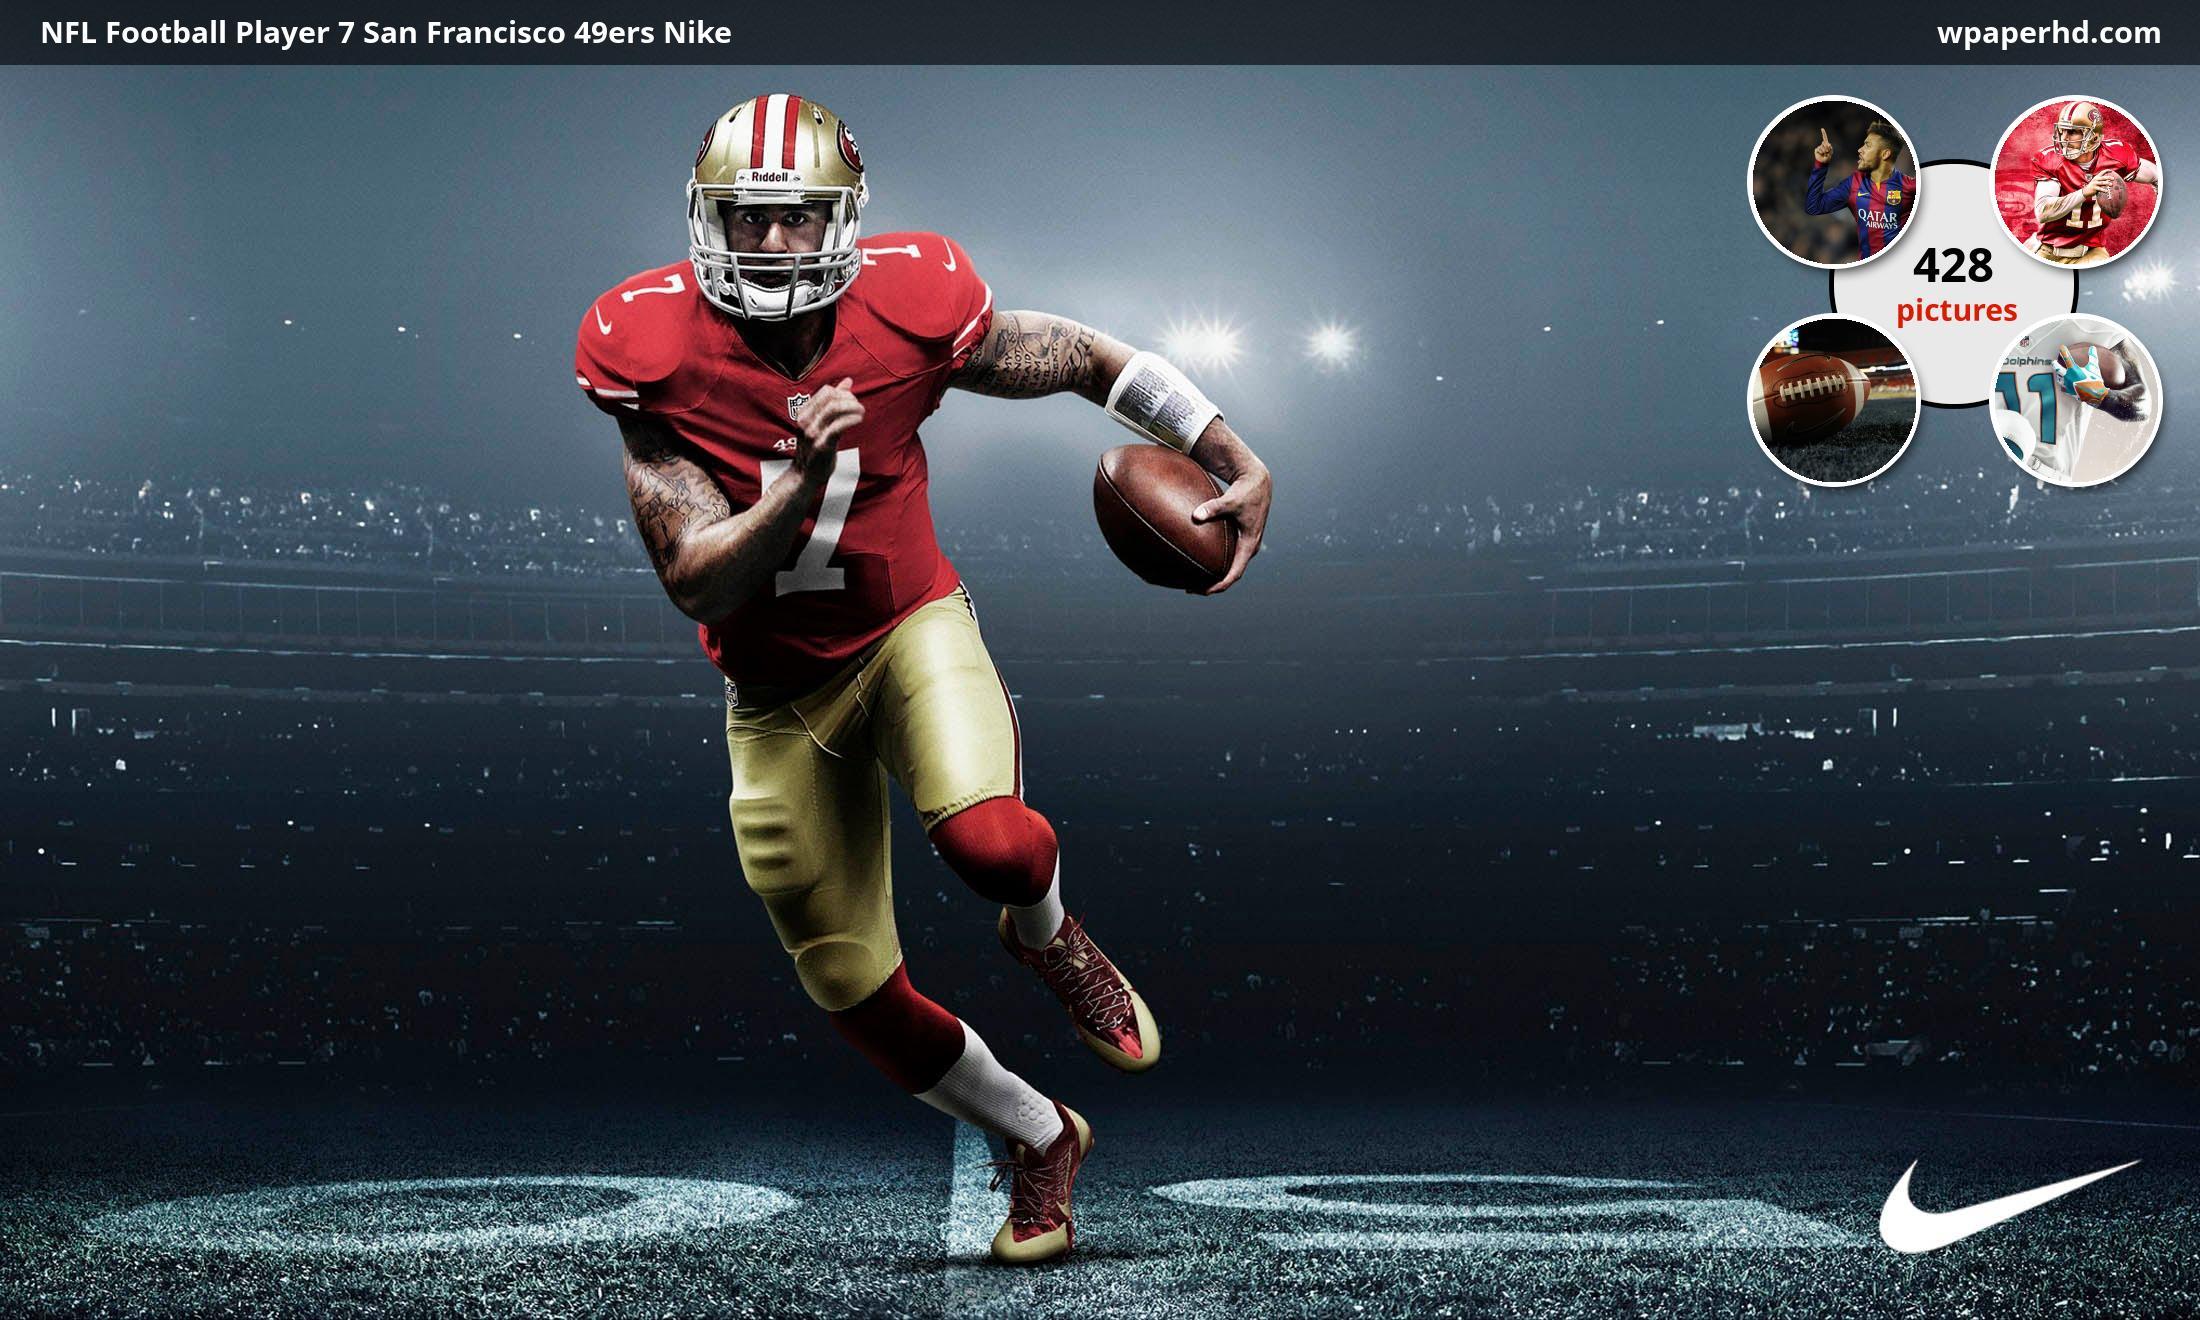 Group Of Nike Wallpaper Football Nfl